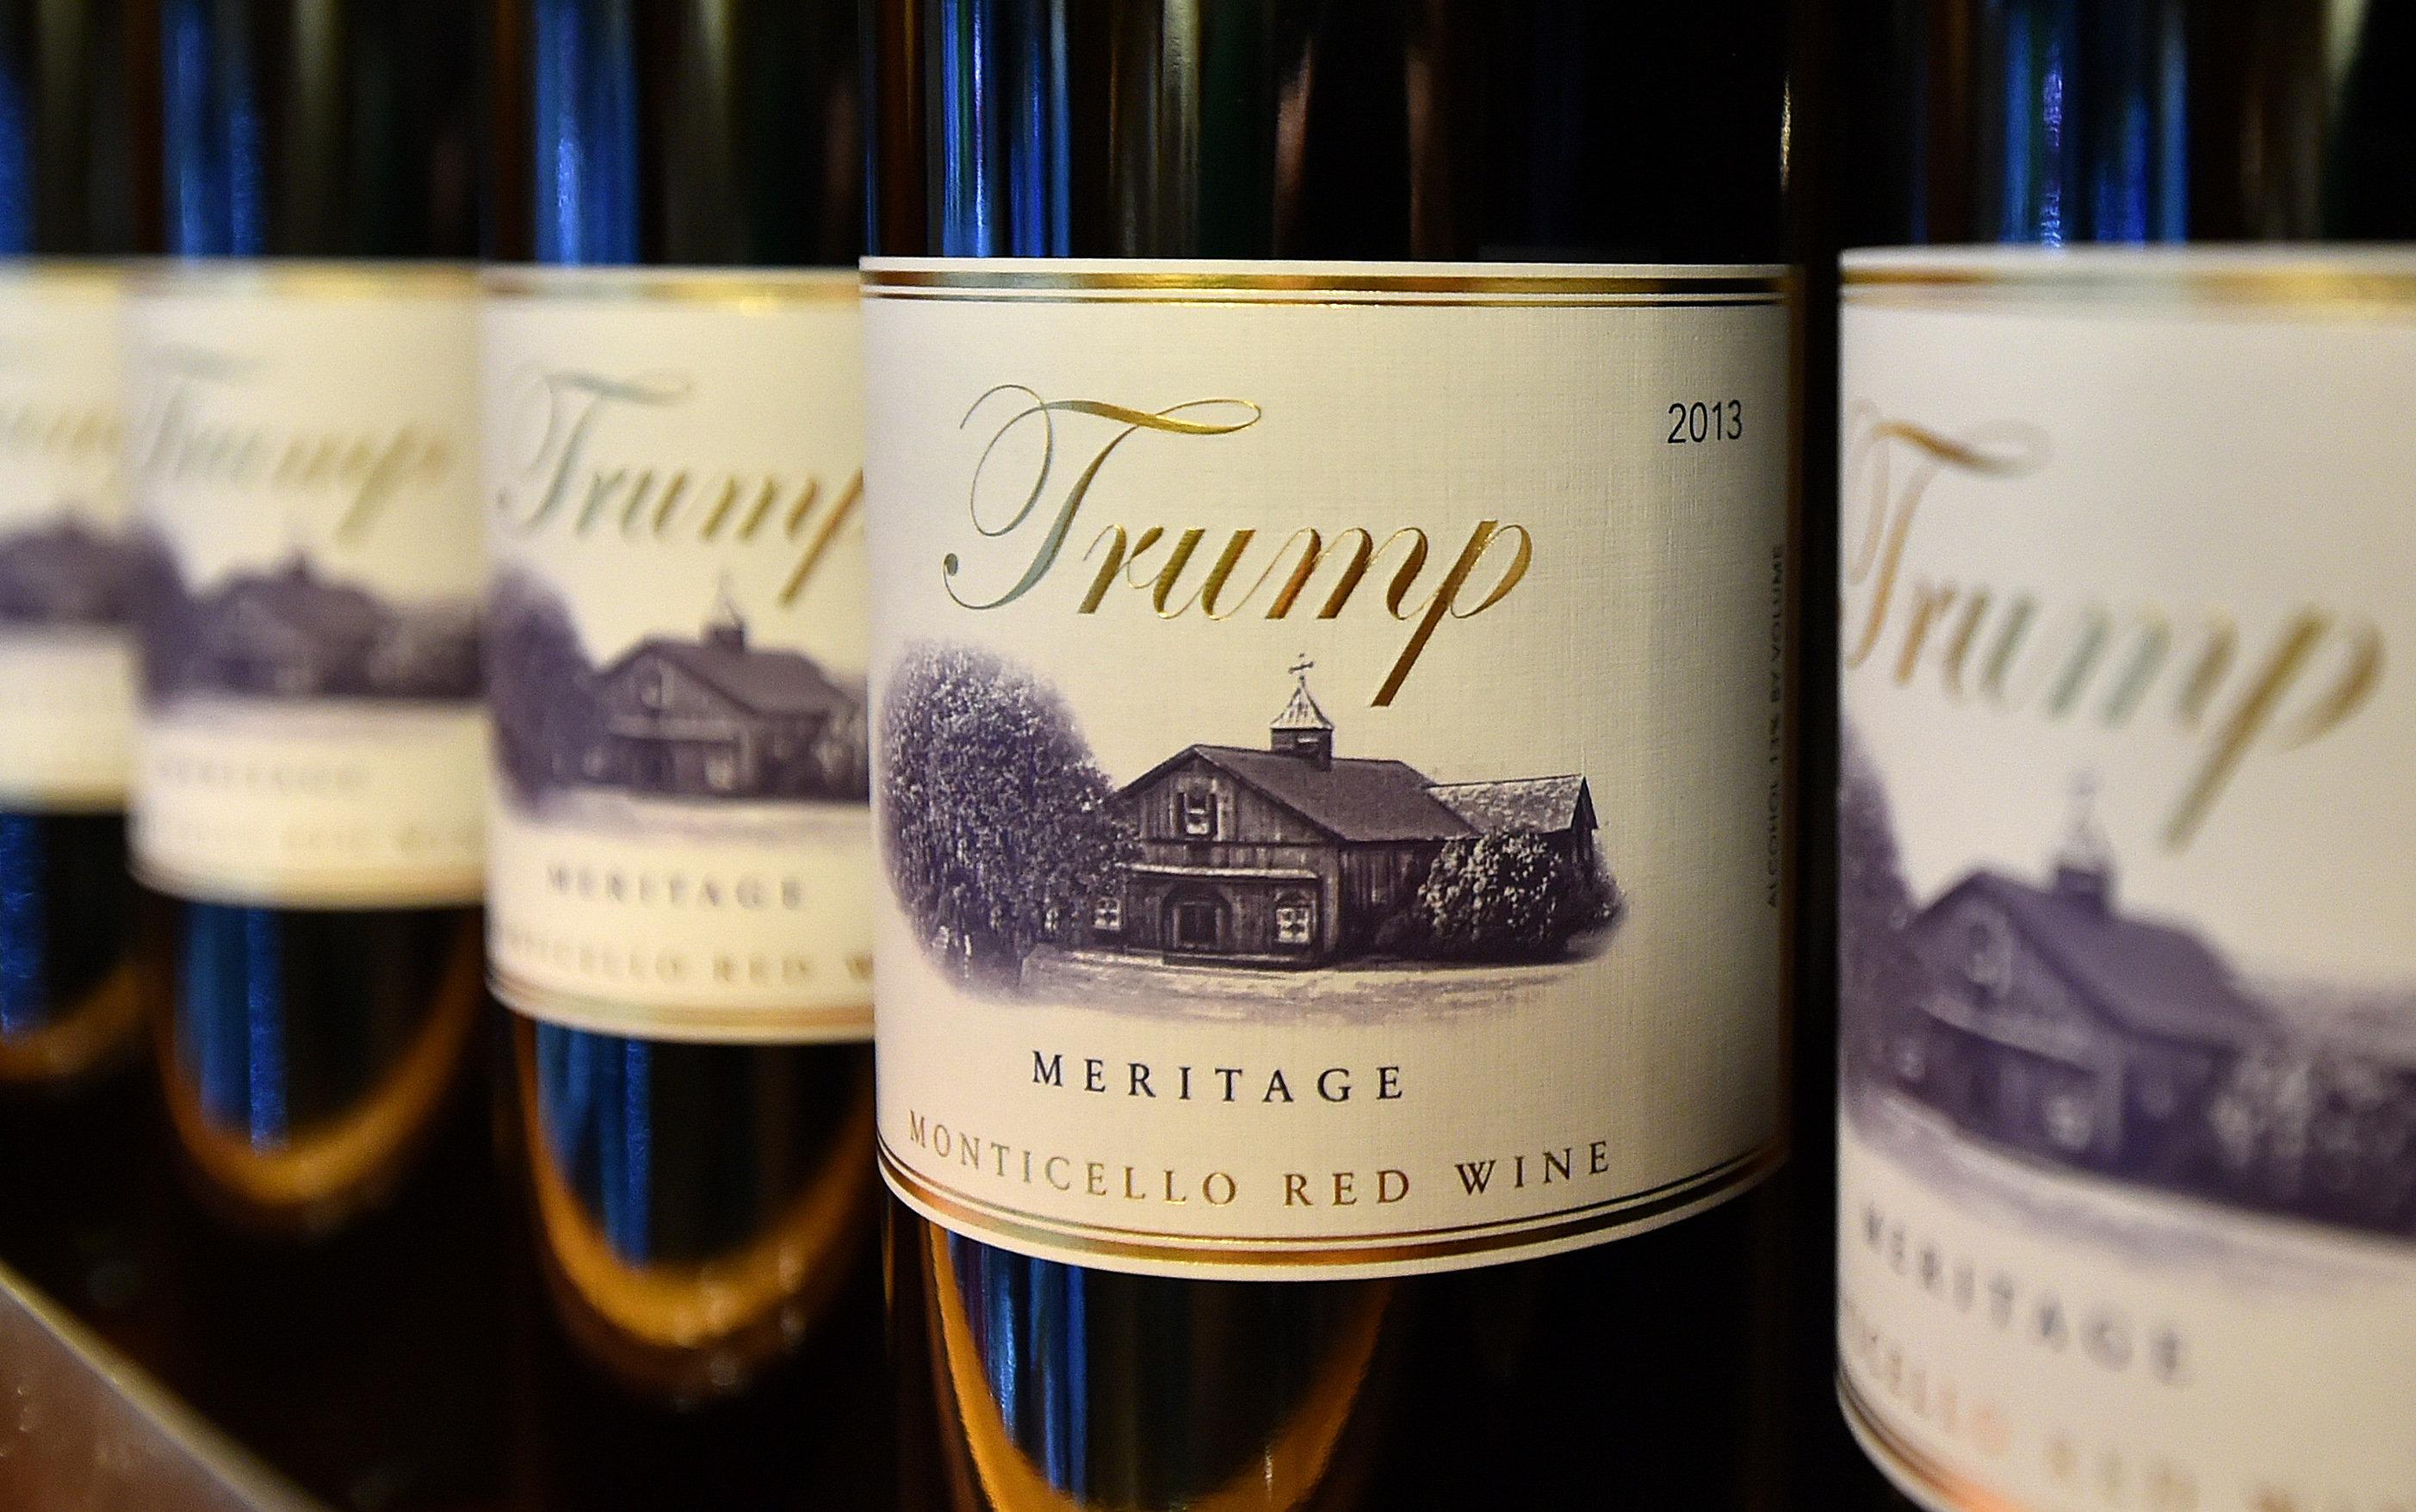 Trump brand wine is seen inside the Trump International Hotel in Las Vegas, Nevada on Feb. 23, 2016.